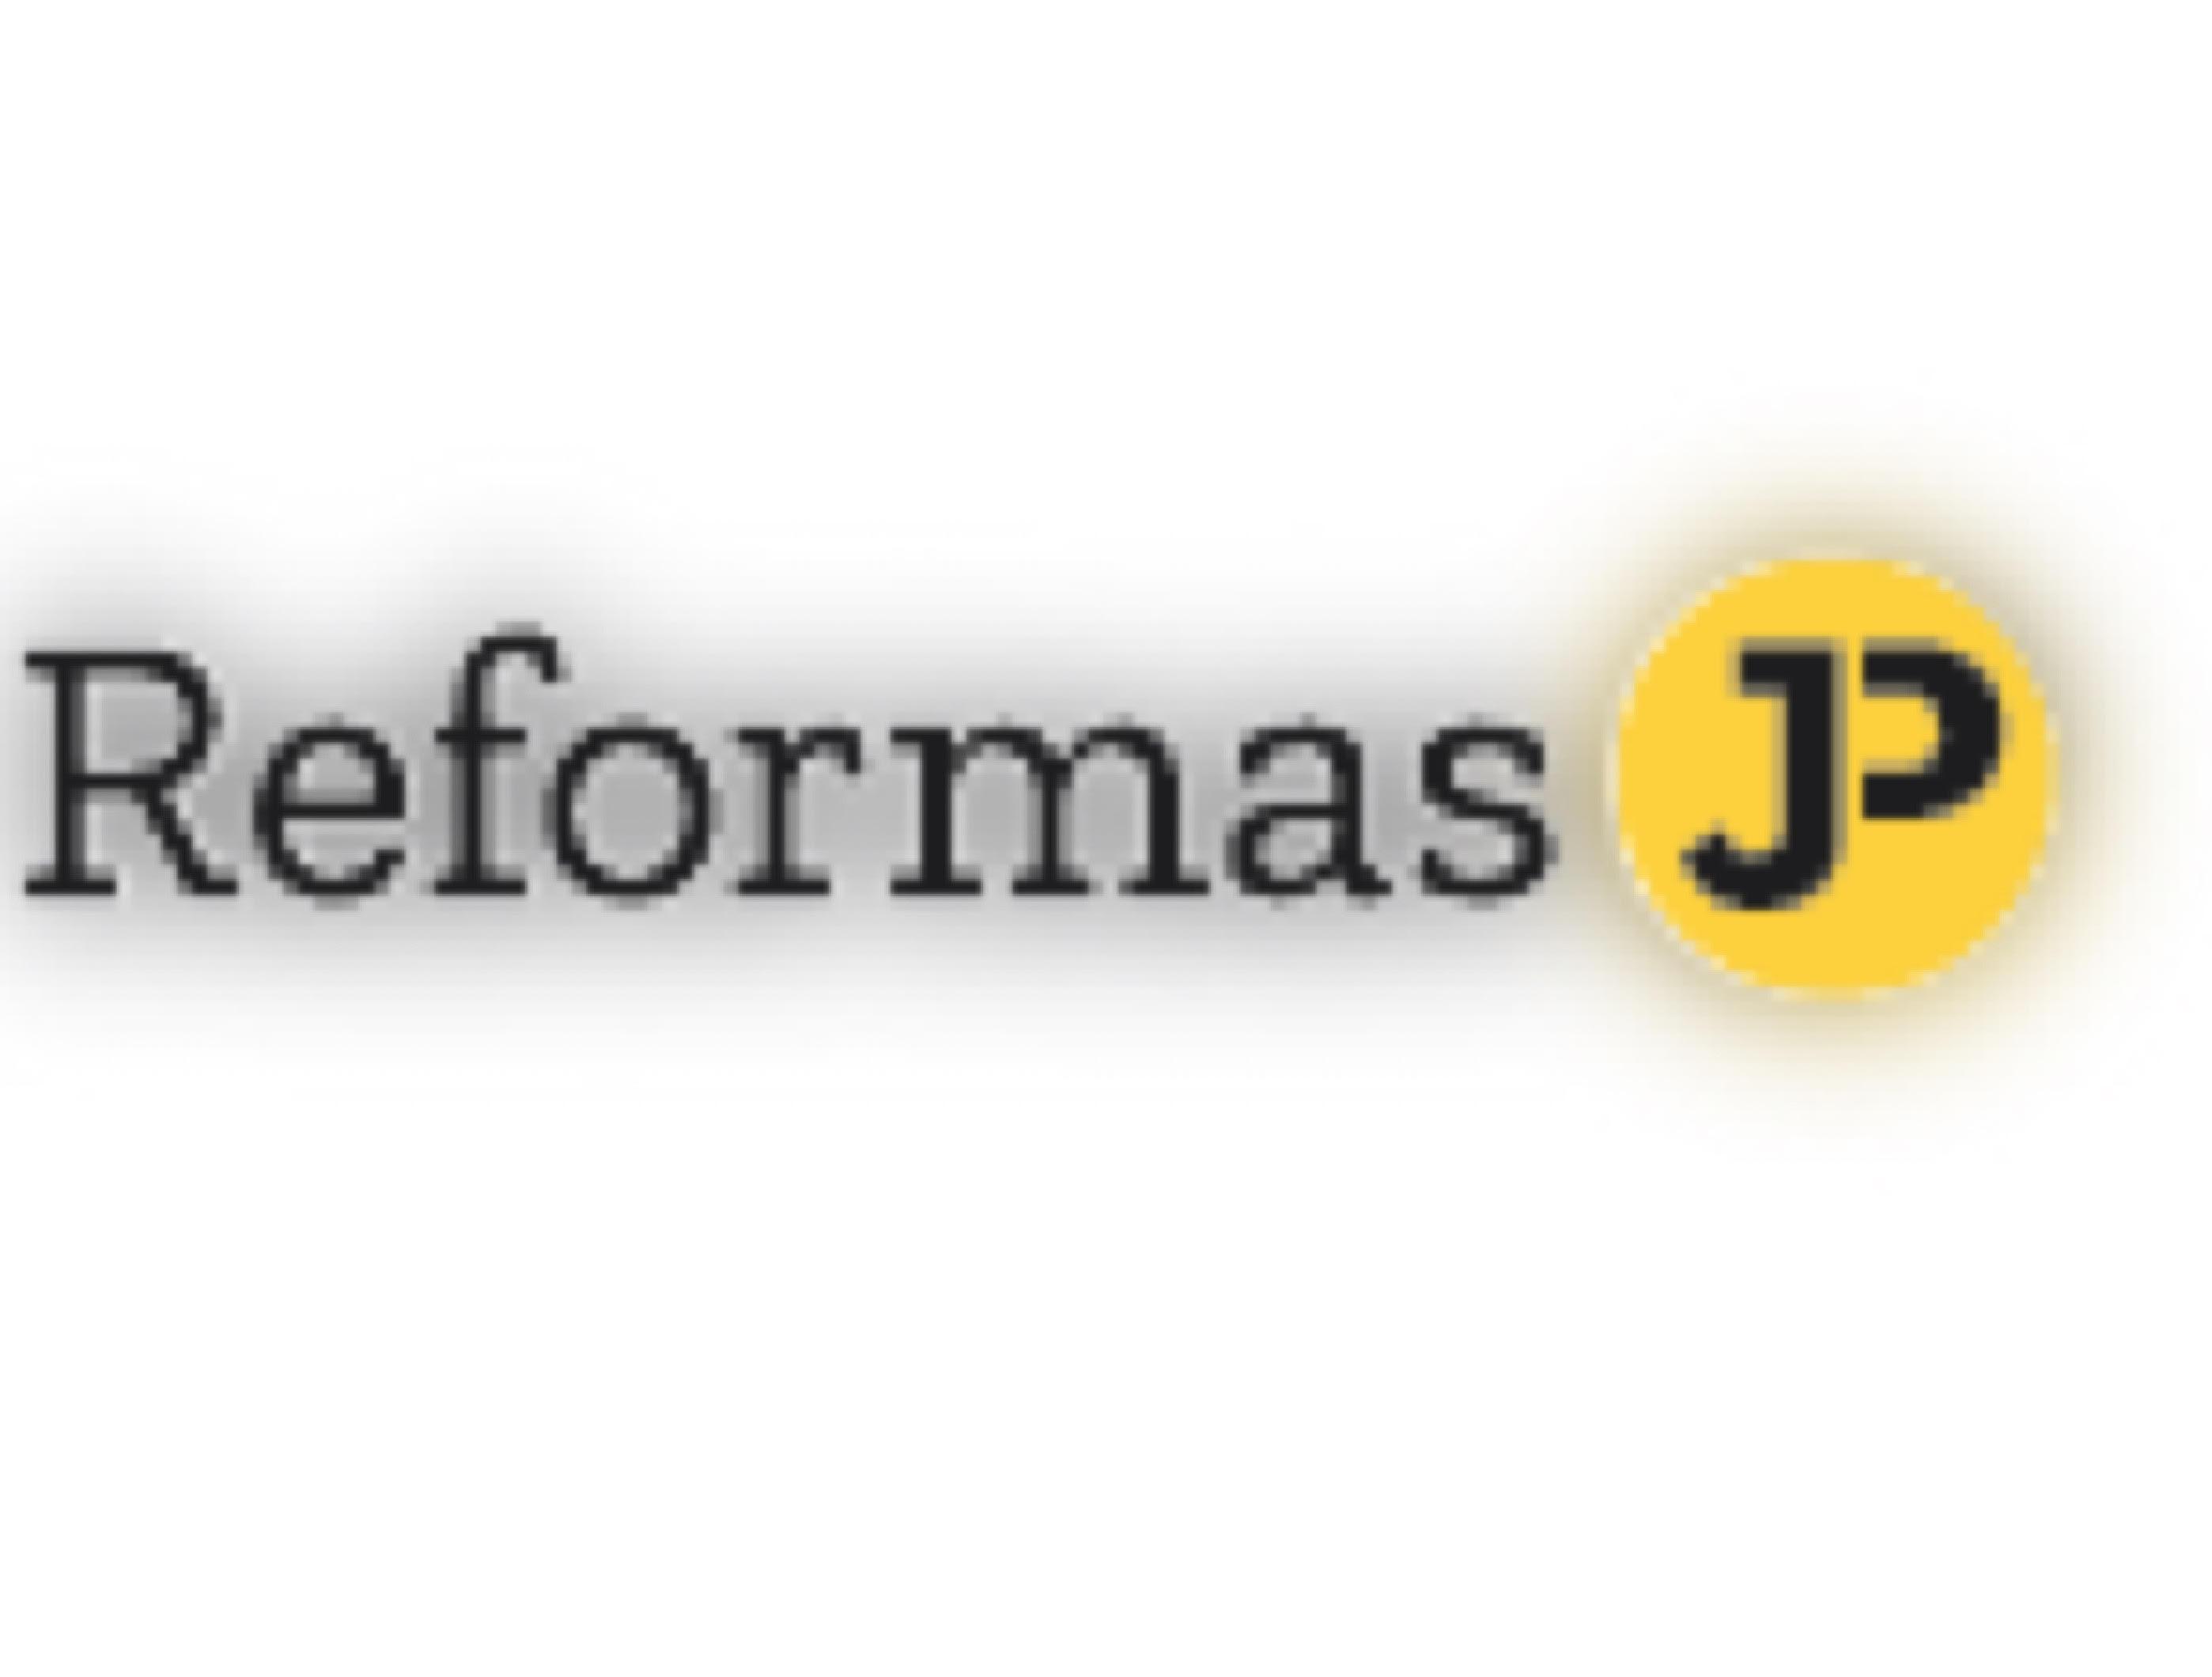 Reformasjp